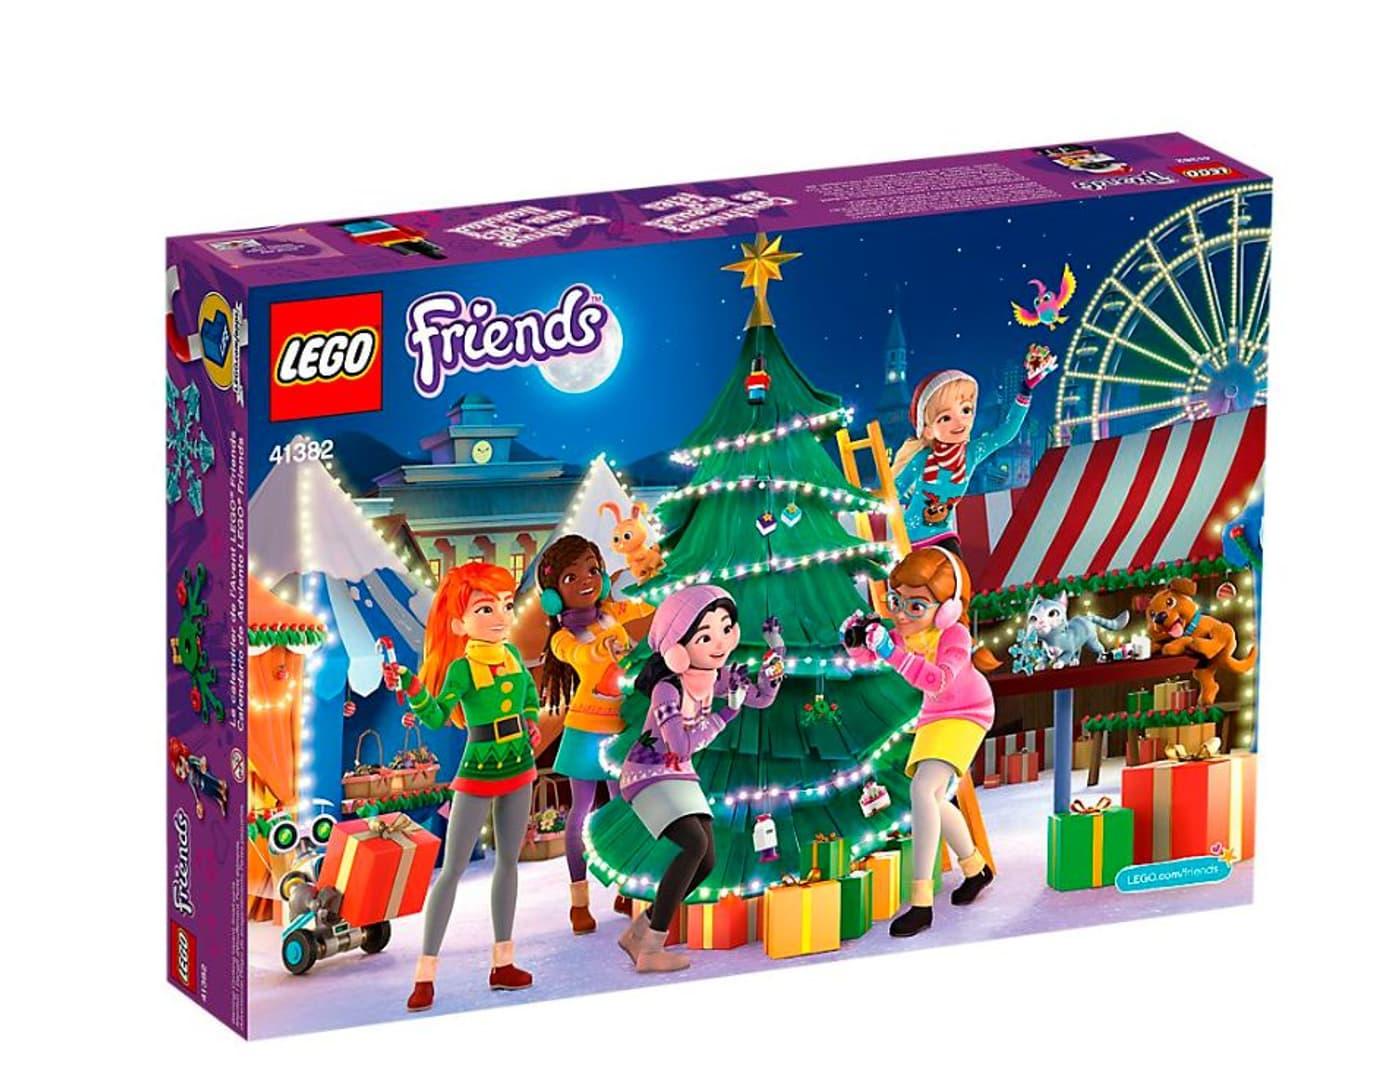 Lego Friends Calendrier De L Avent.Migros Calendrier De L Avent Lego Friends